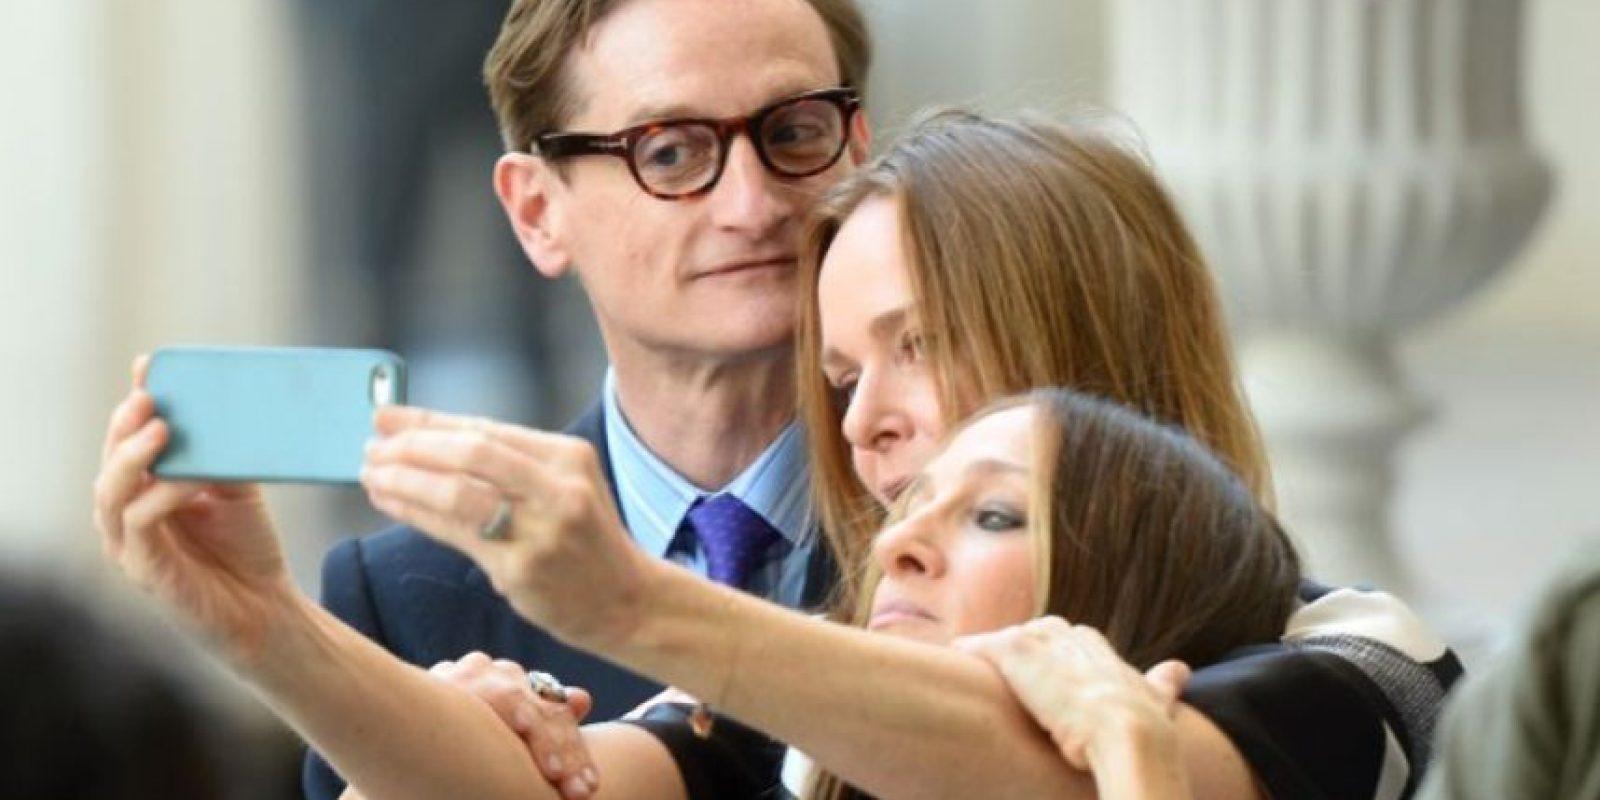 Selfie entre amigos, Hamish Bowles, Stella McCartney y Sarah Jessica Parker Foto:Getty Images